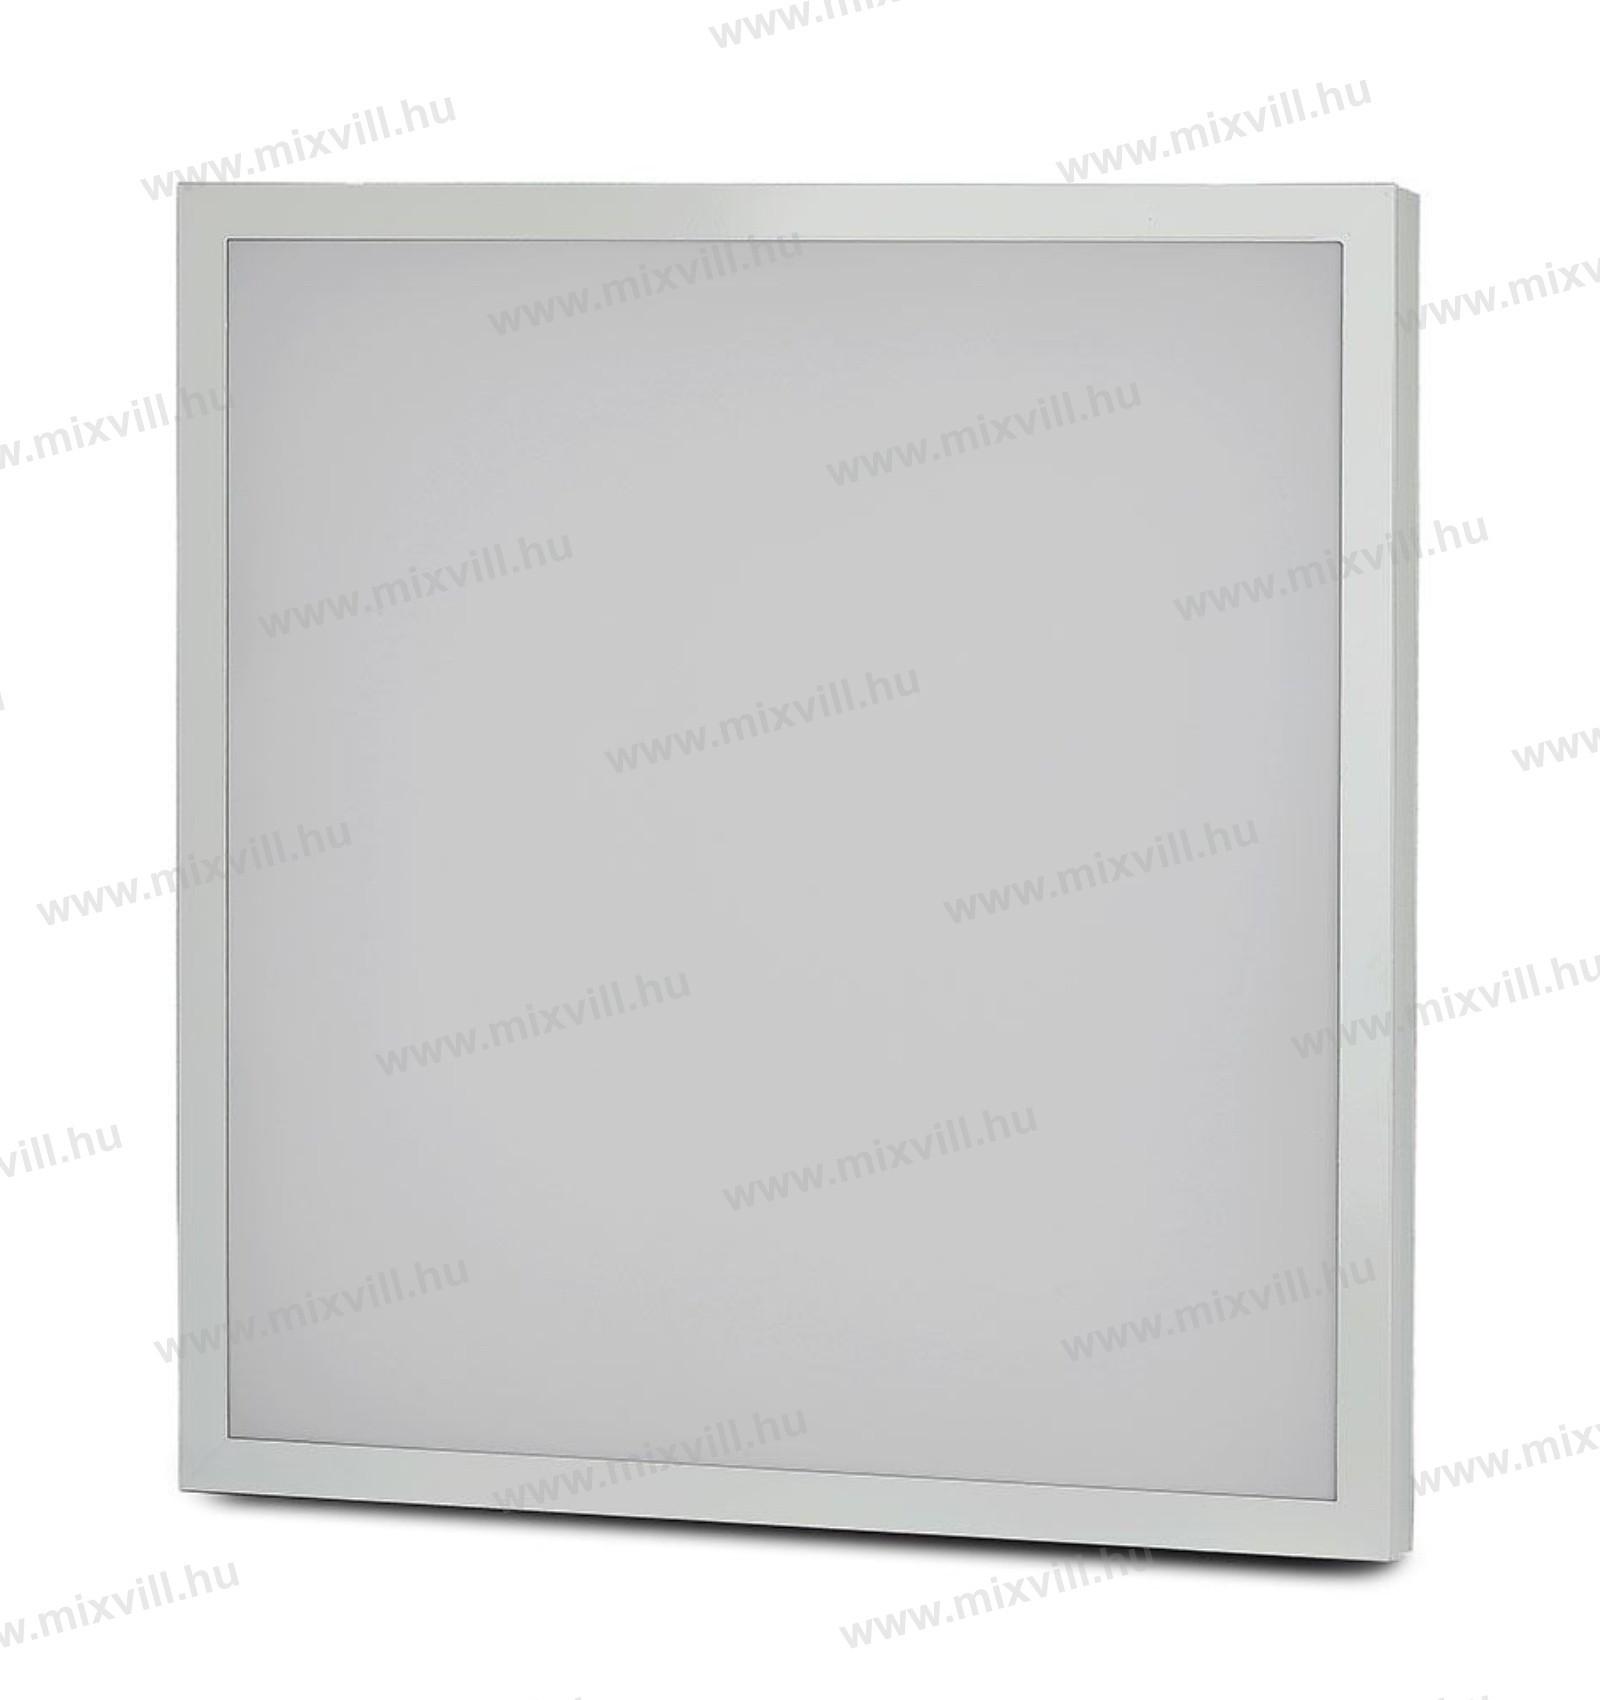 v-tac-6600-60x60cm-led-panel-allmennyezetbe-falon-kivul-18w-hideg-feher-6000k-